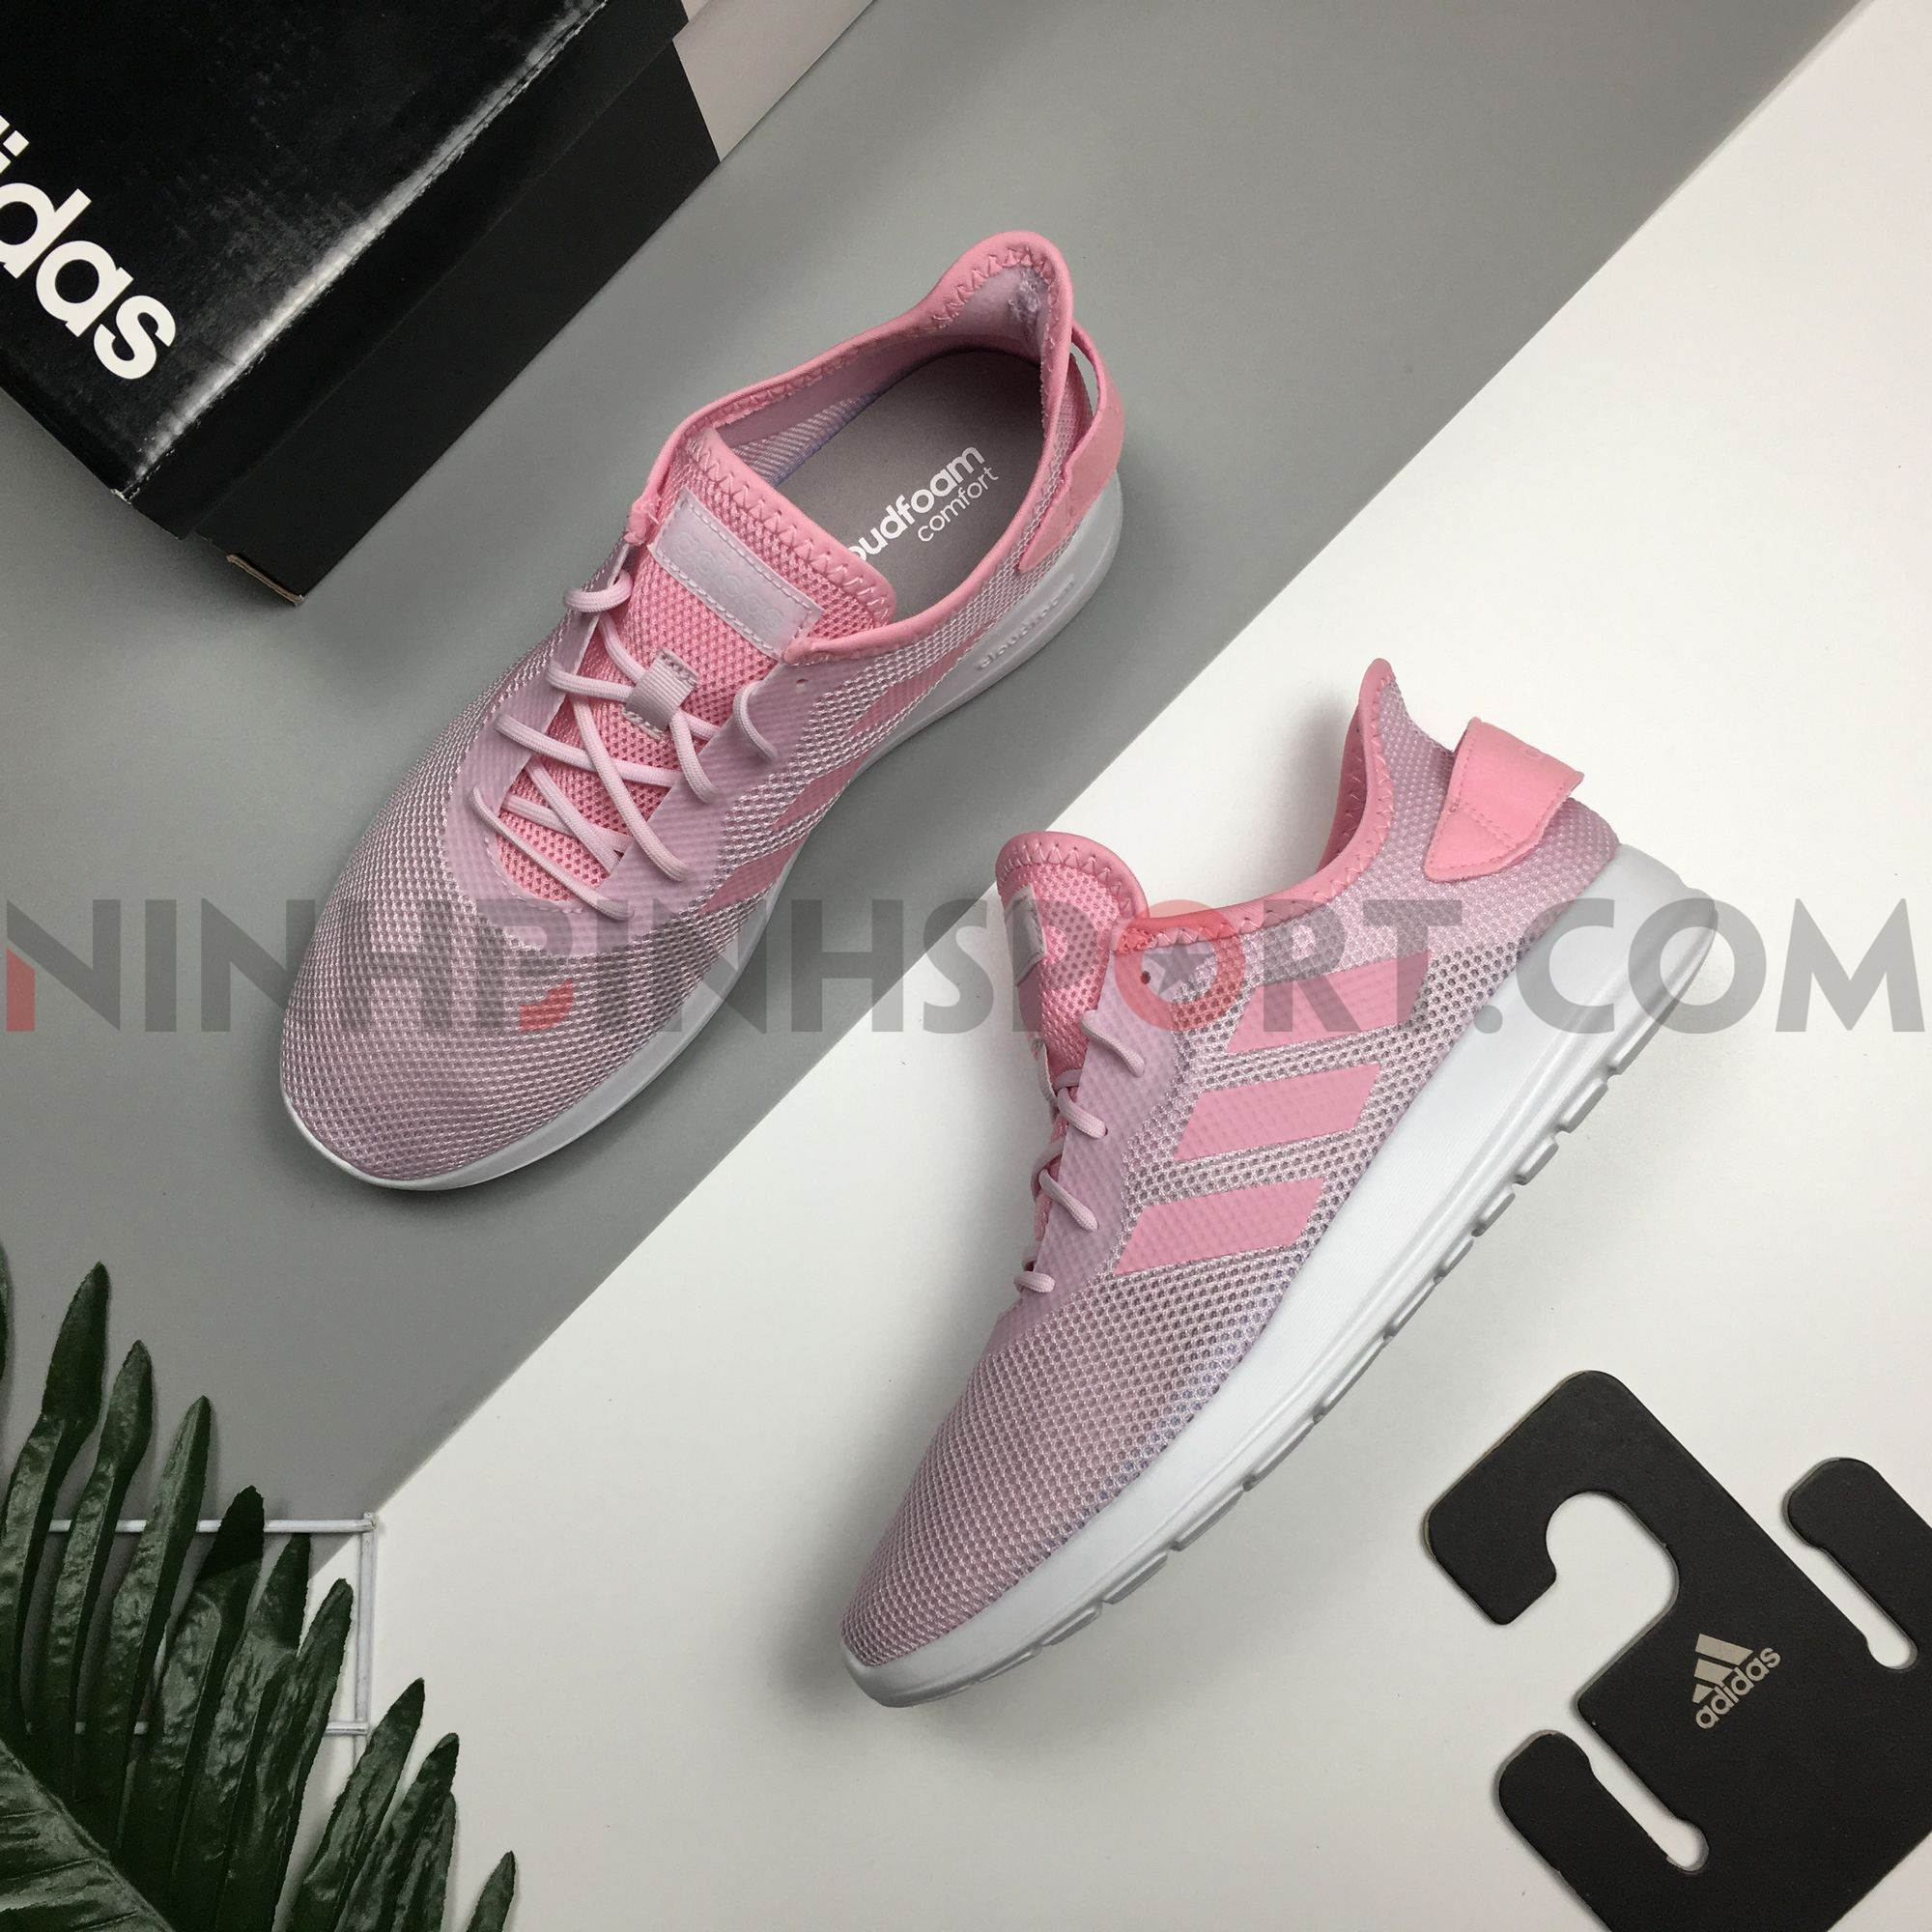 Giầy thể thao nữ Adidas Yatra Pink F36514